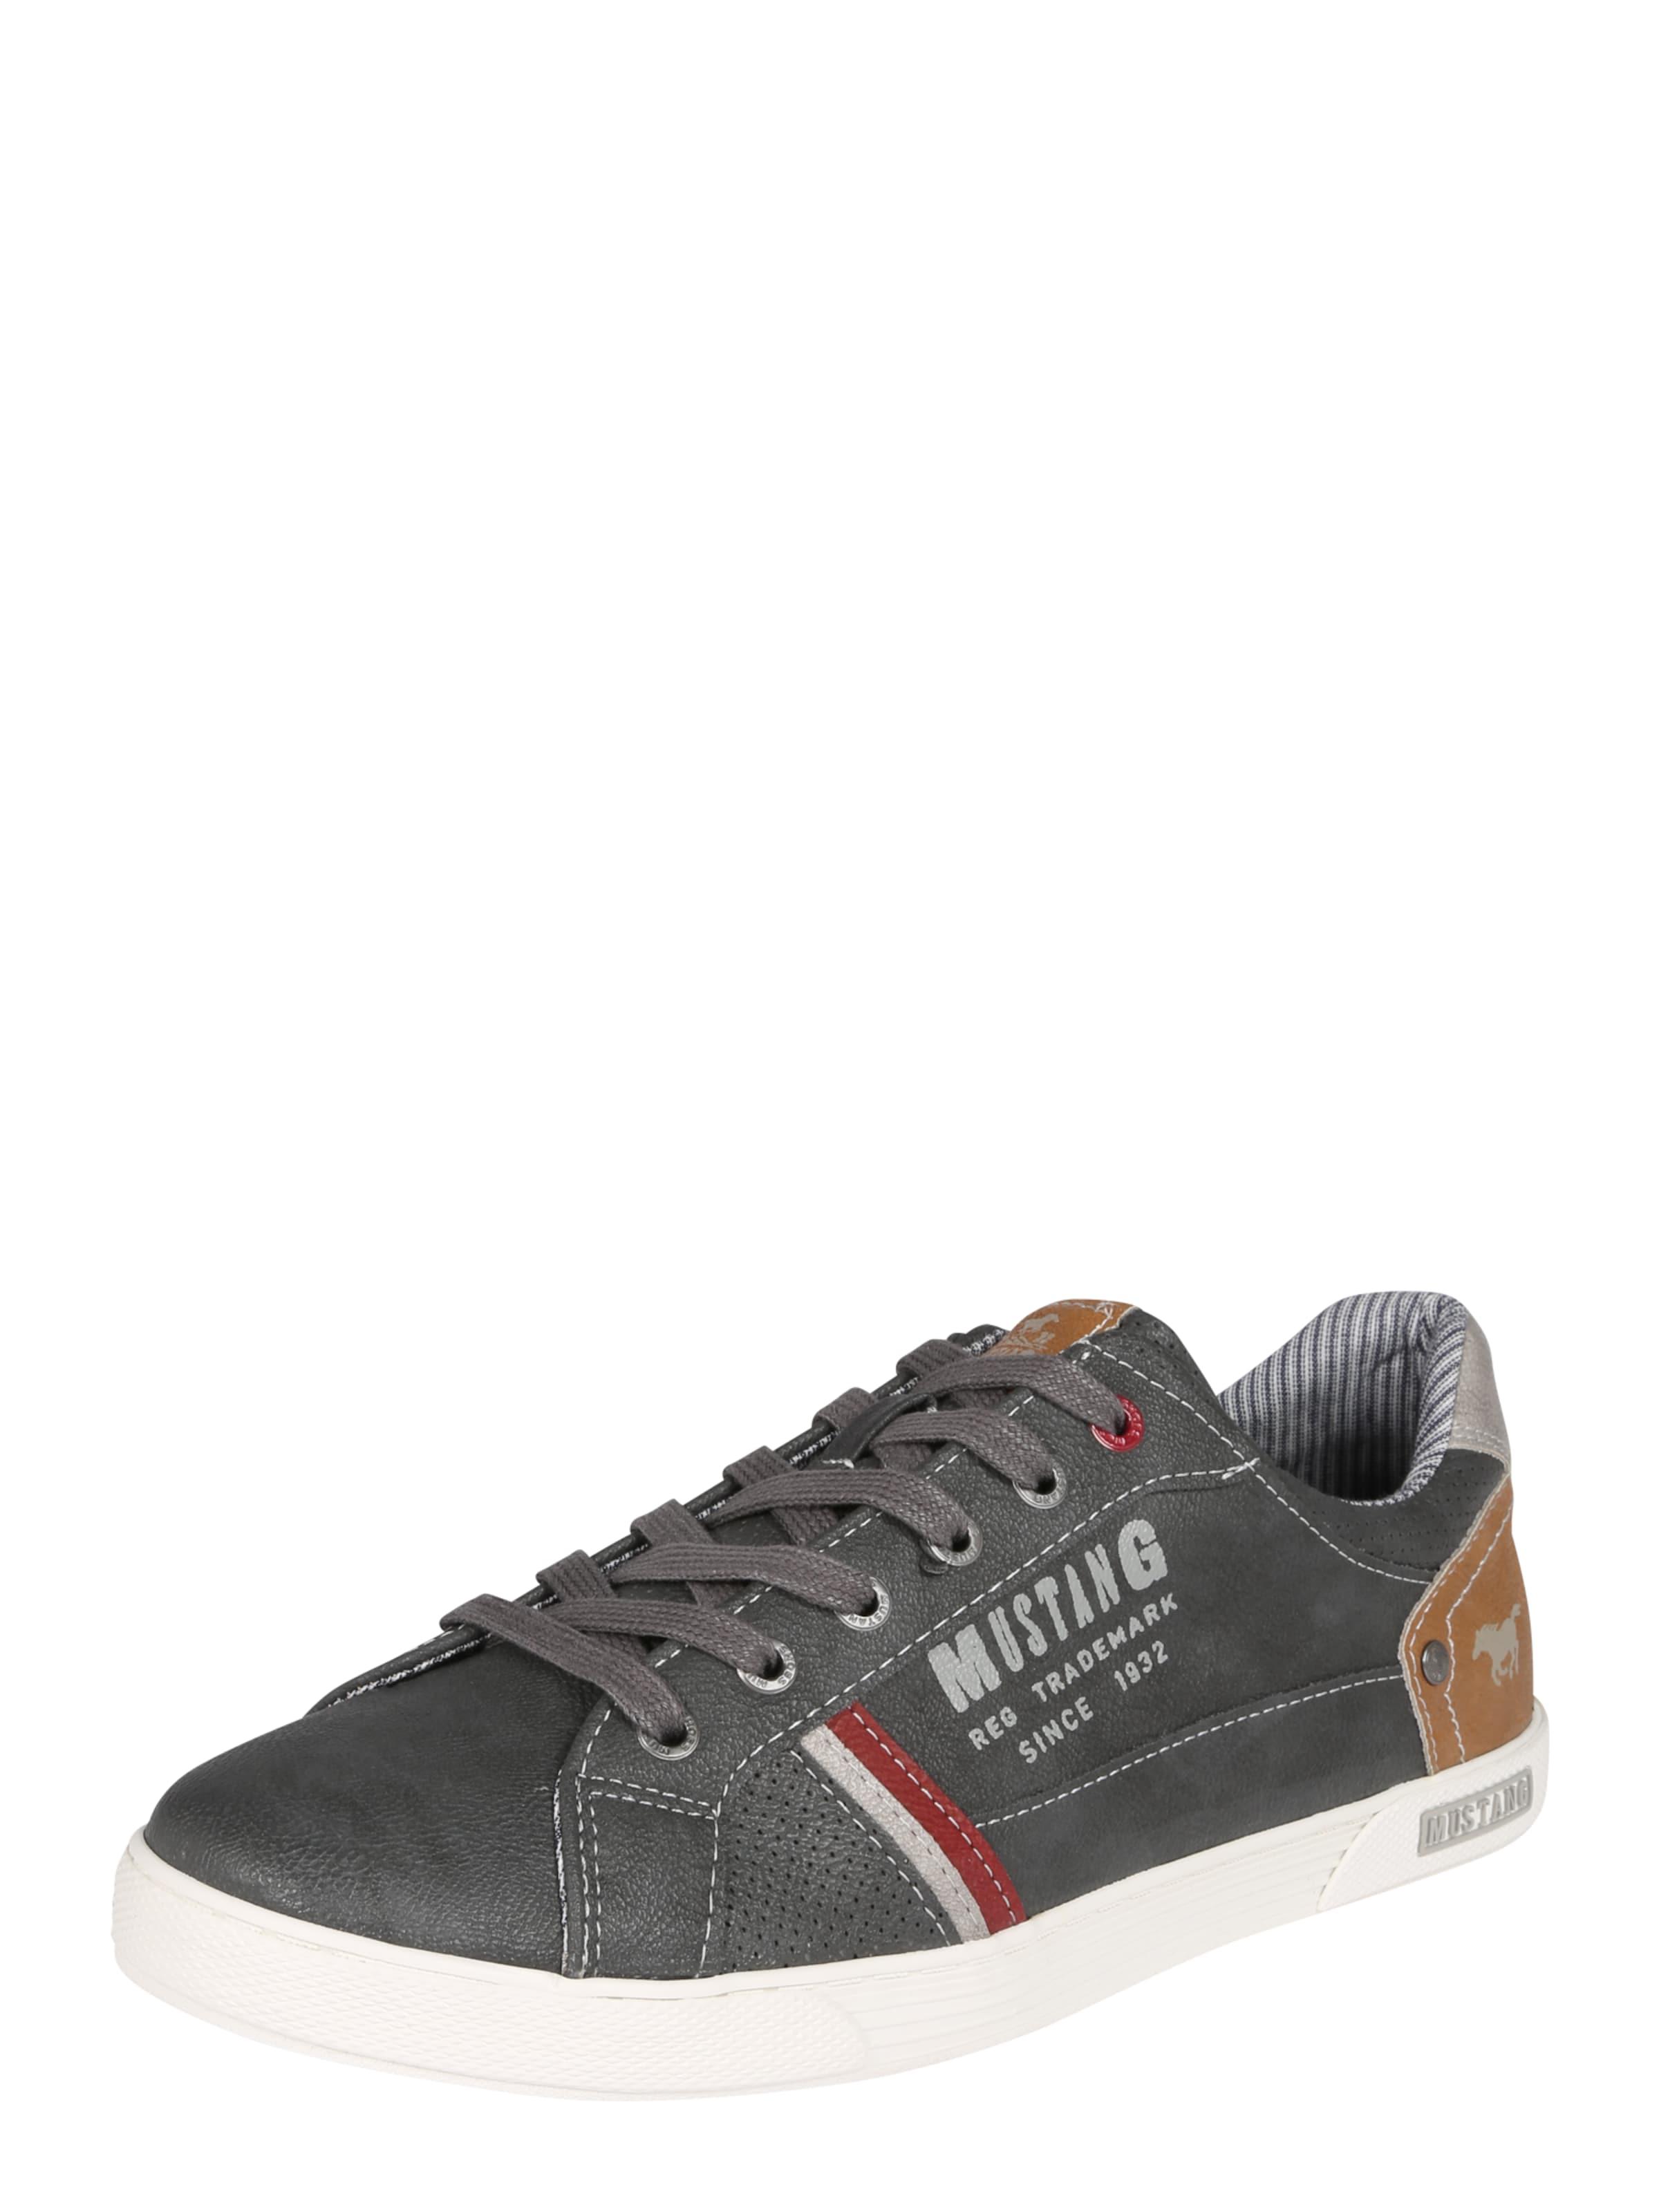 MUSTANG Sneaker  easy going